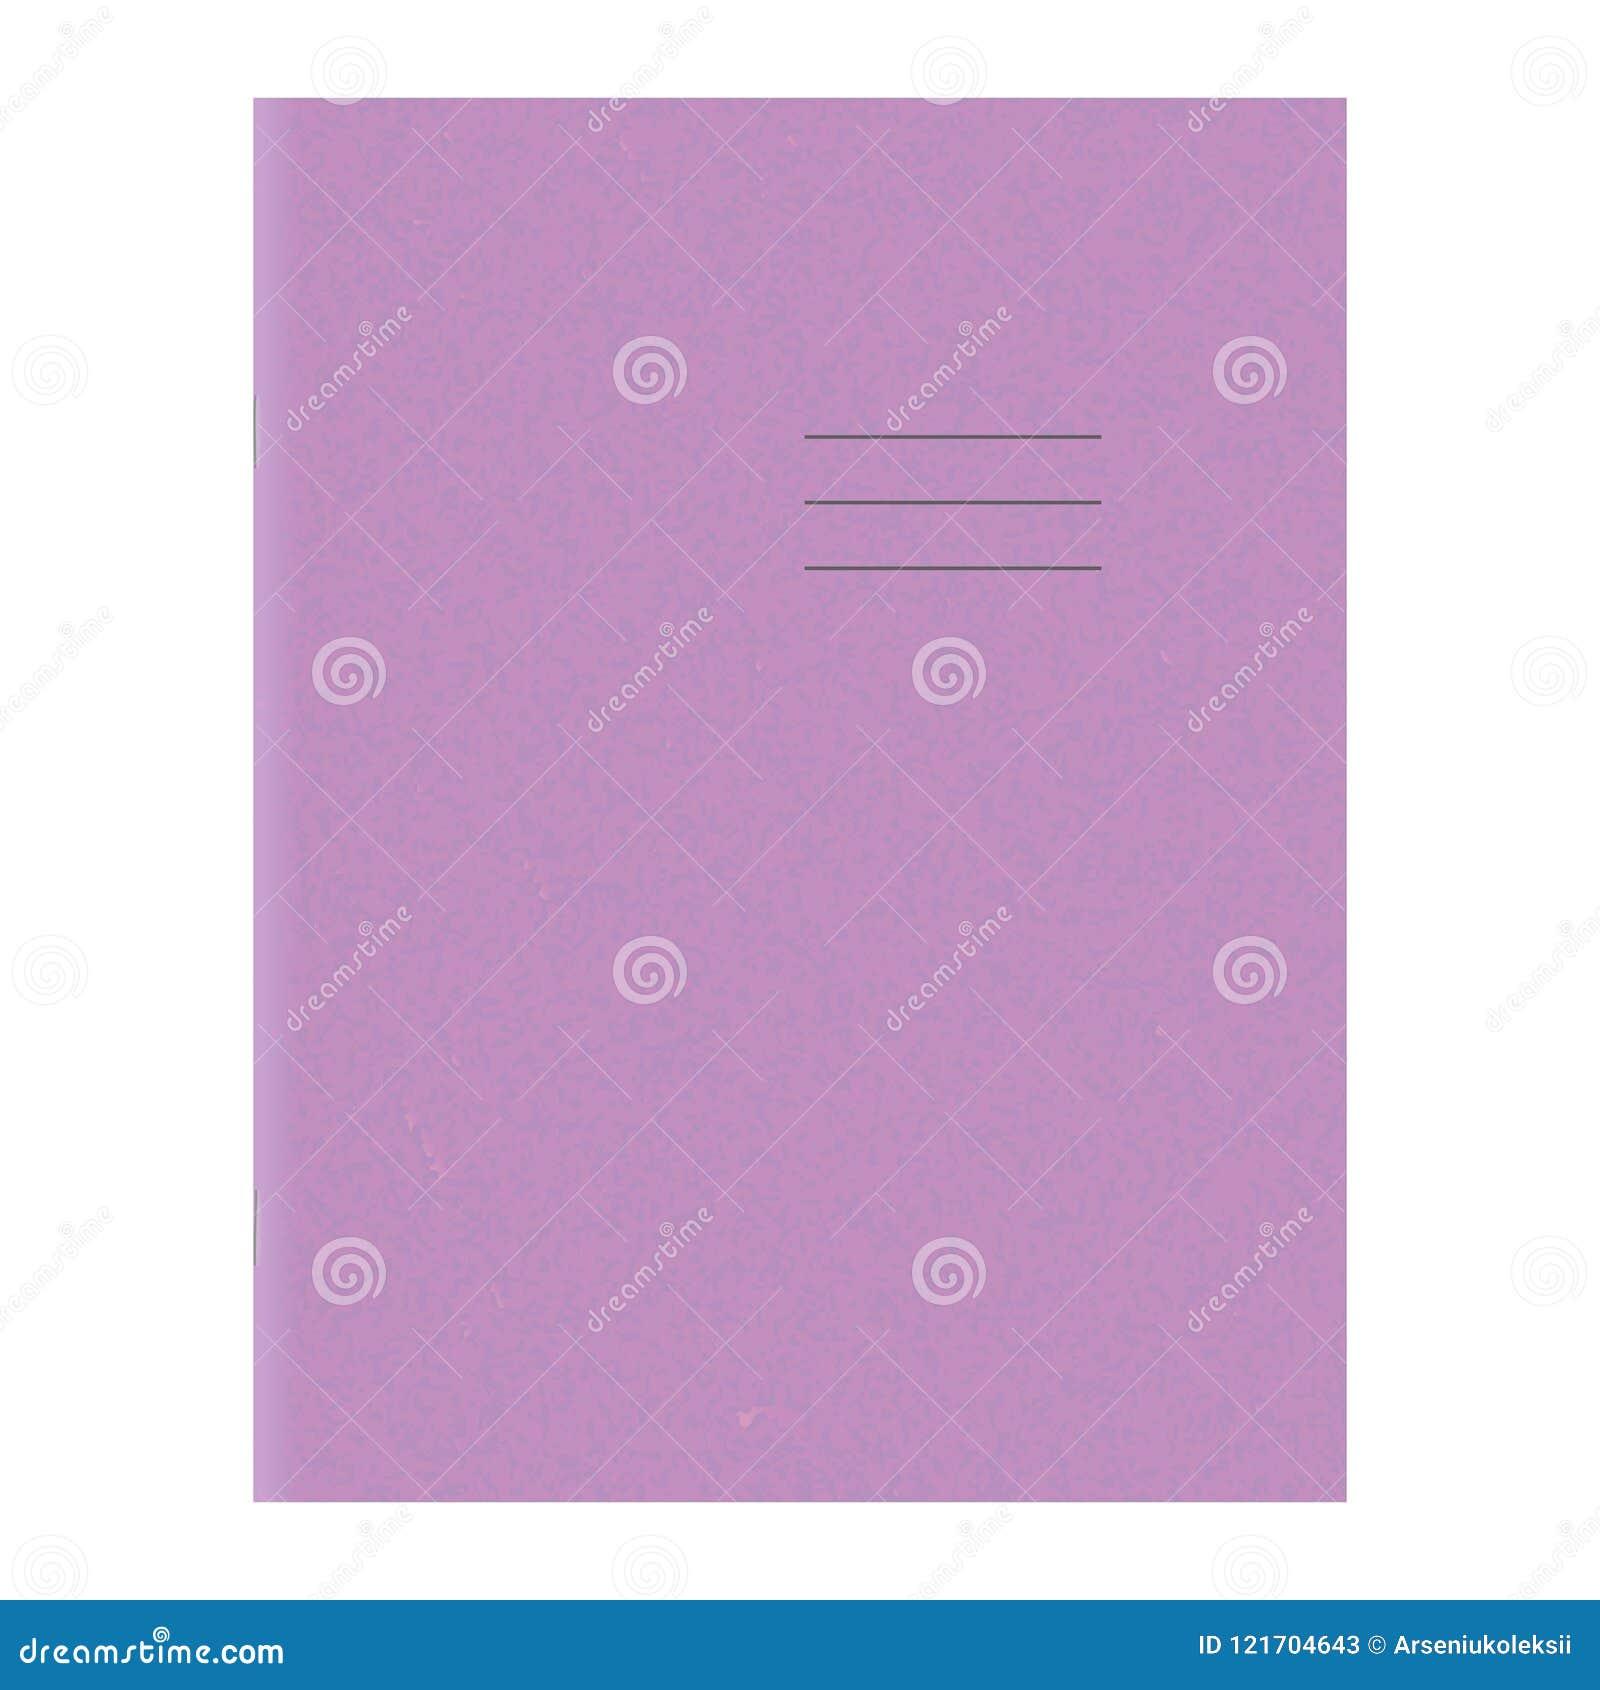 Exercise Book Template Blank School Workbook Cover Stock Vector